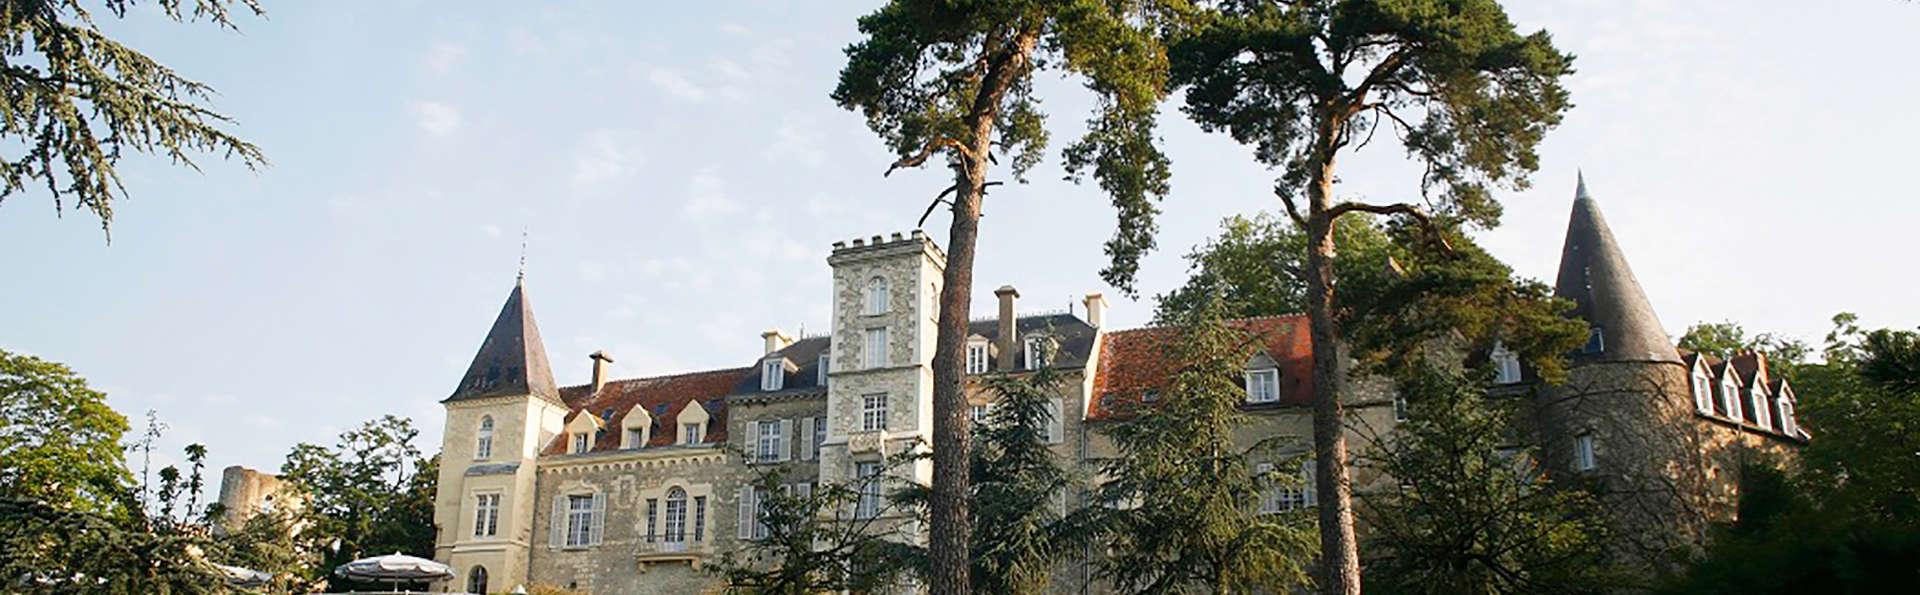 Château de Fere - edit_facade.jpg